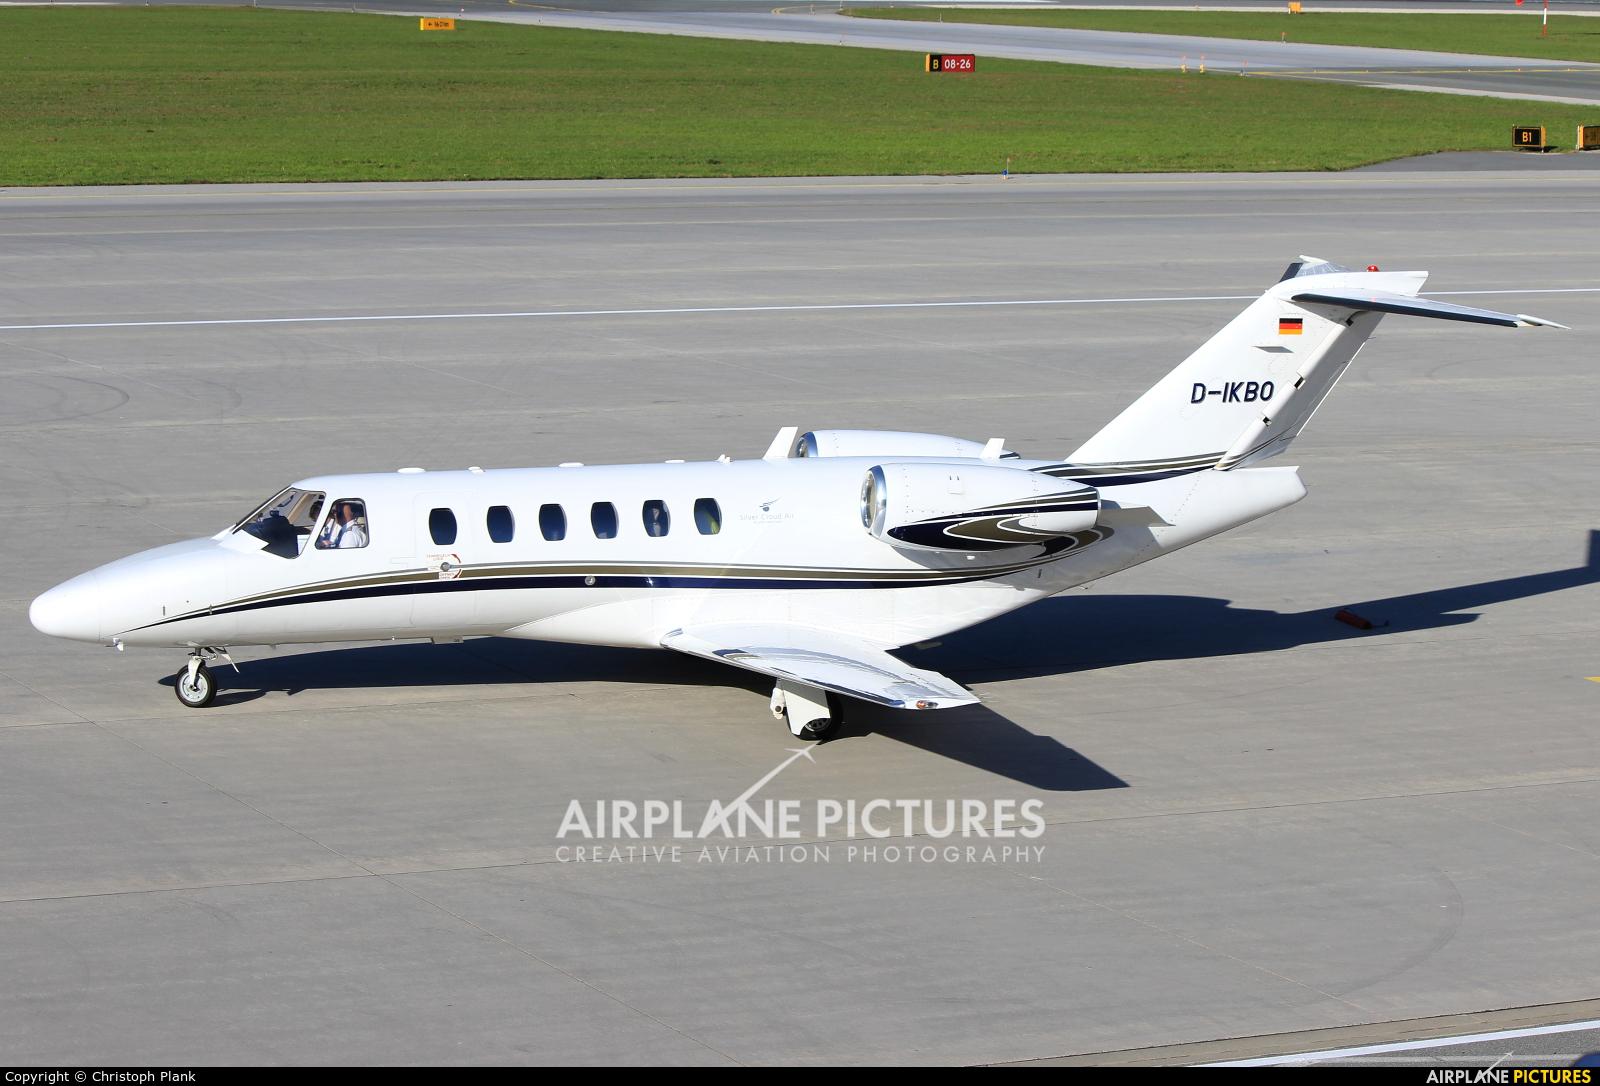 Silver Cloud Air D-IKBO aircraft at Innsbruck